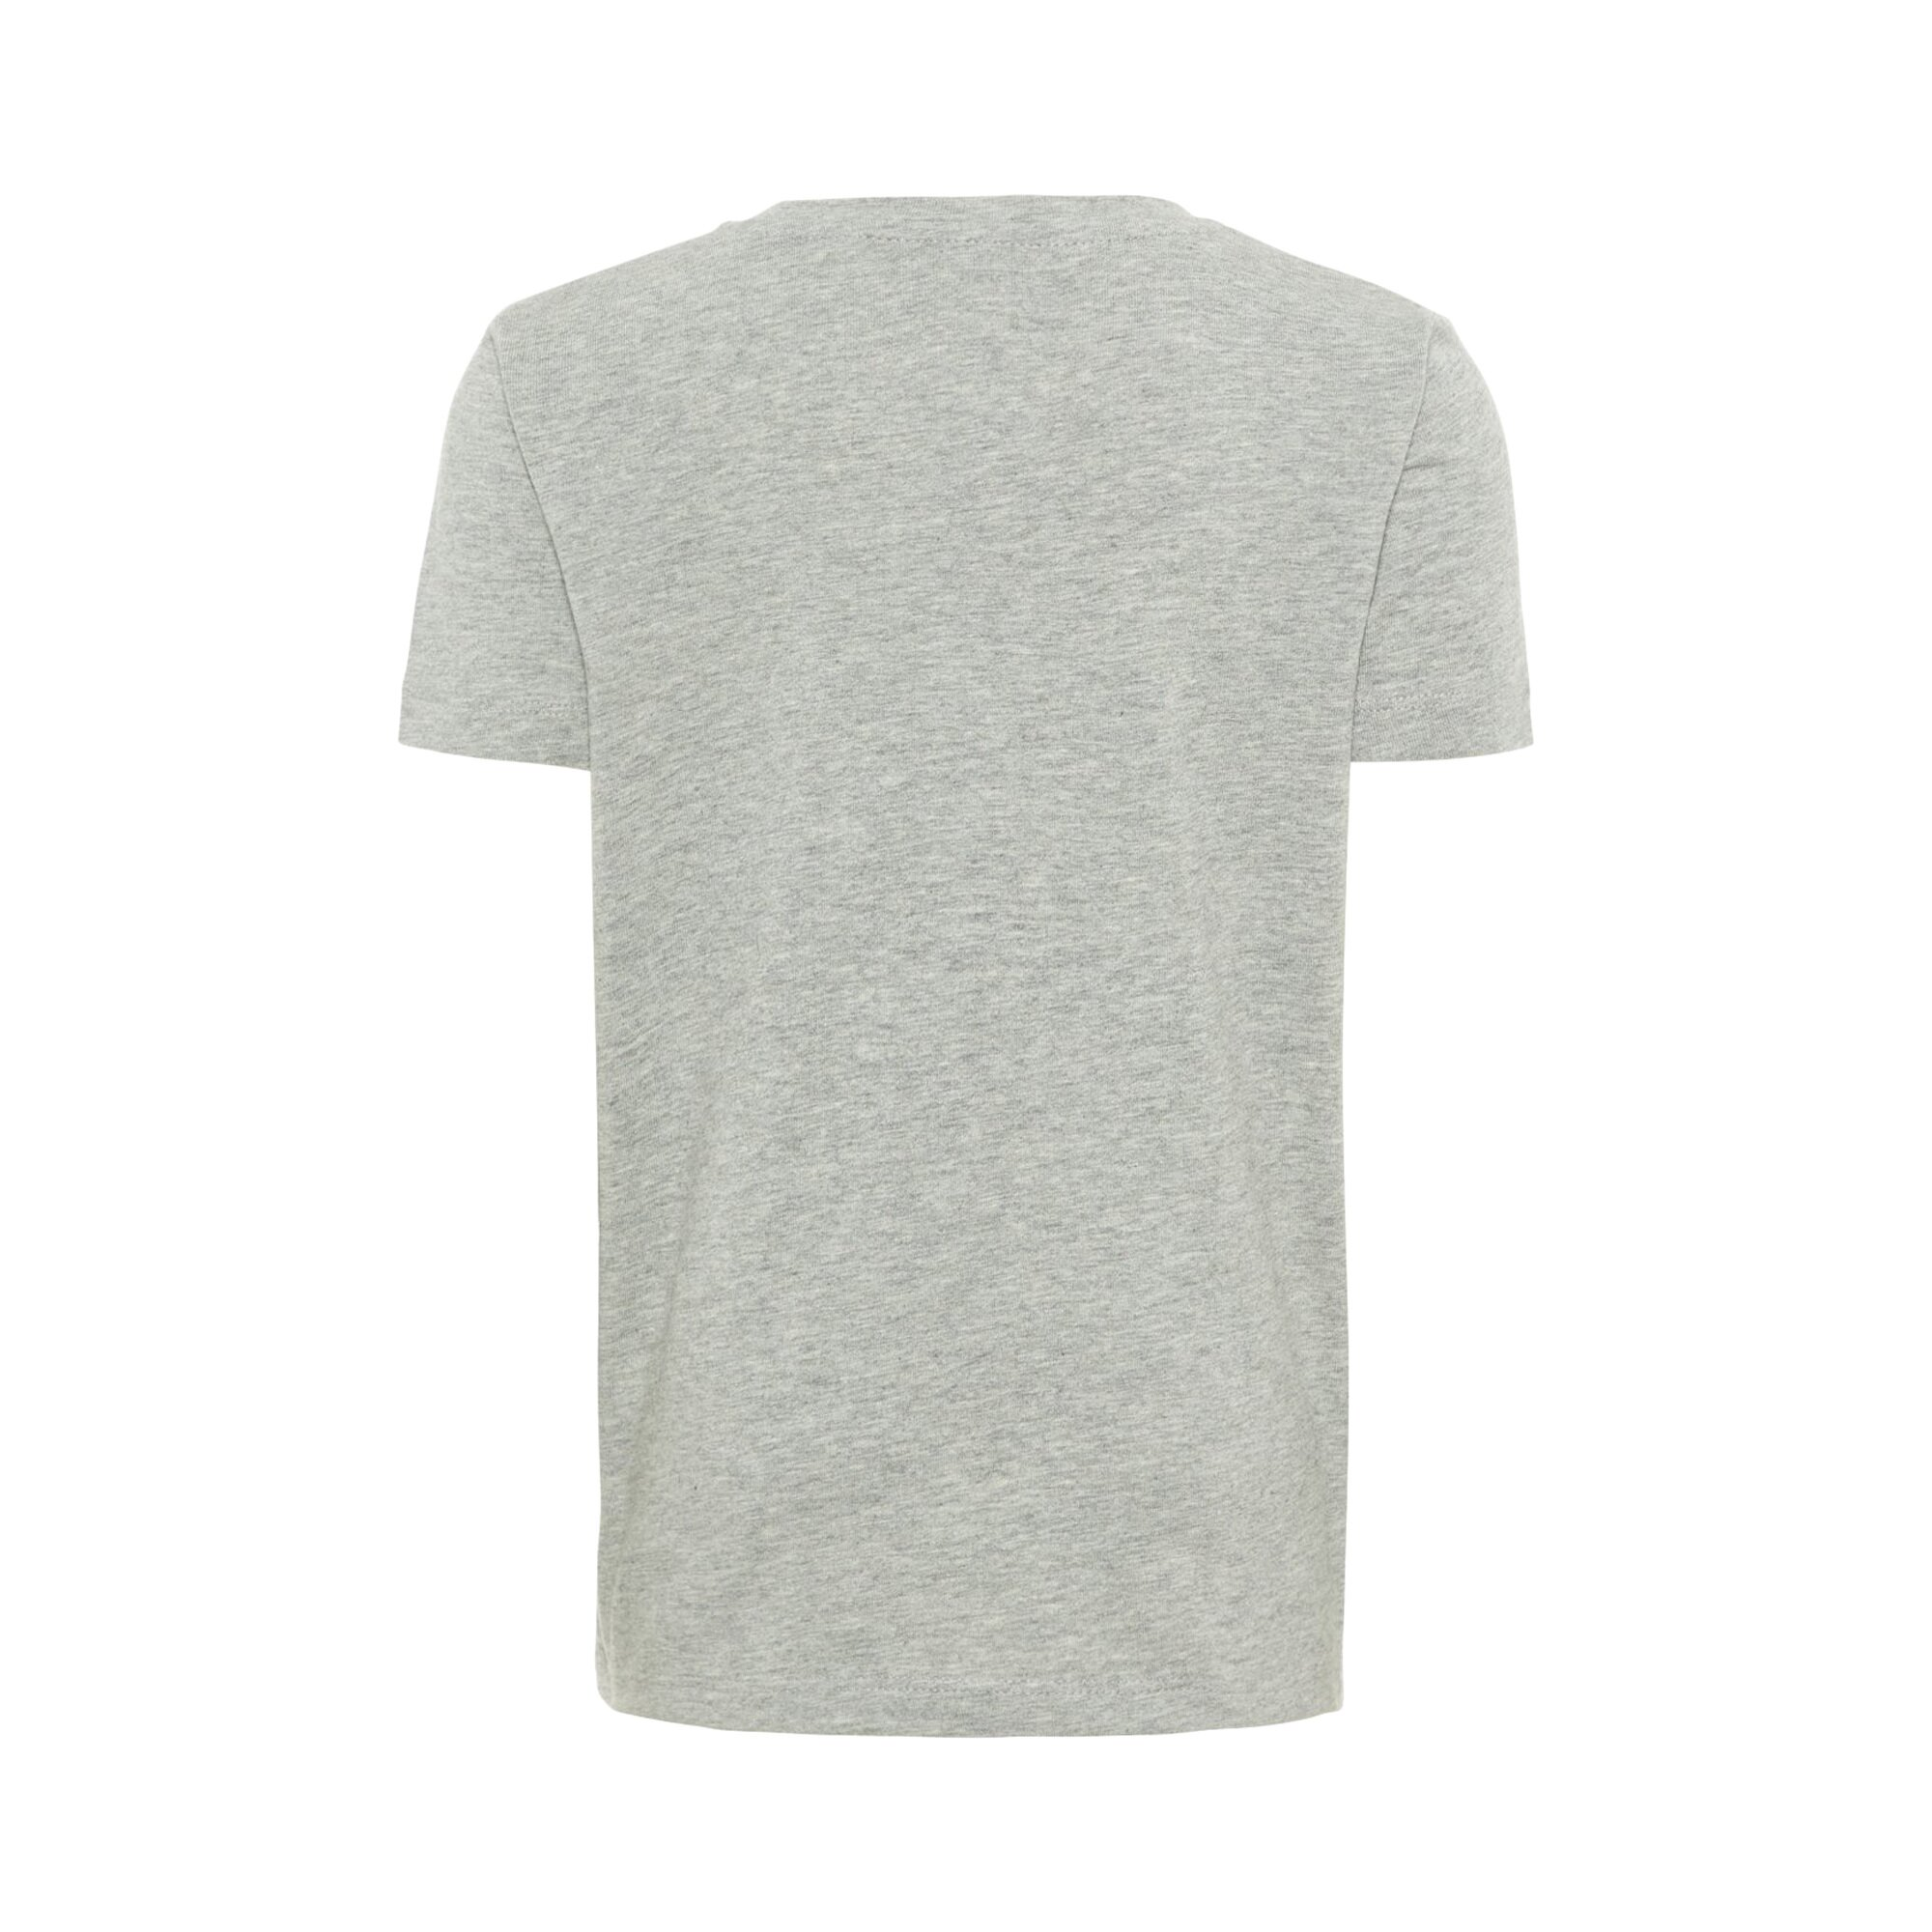 name-it-t-shirt-cool